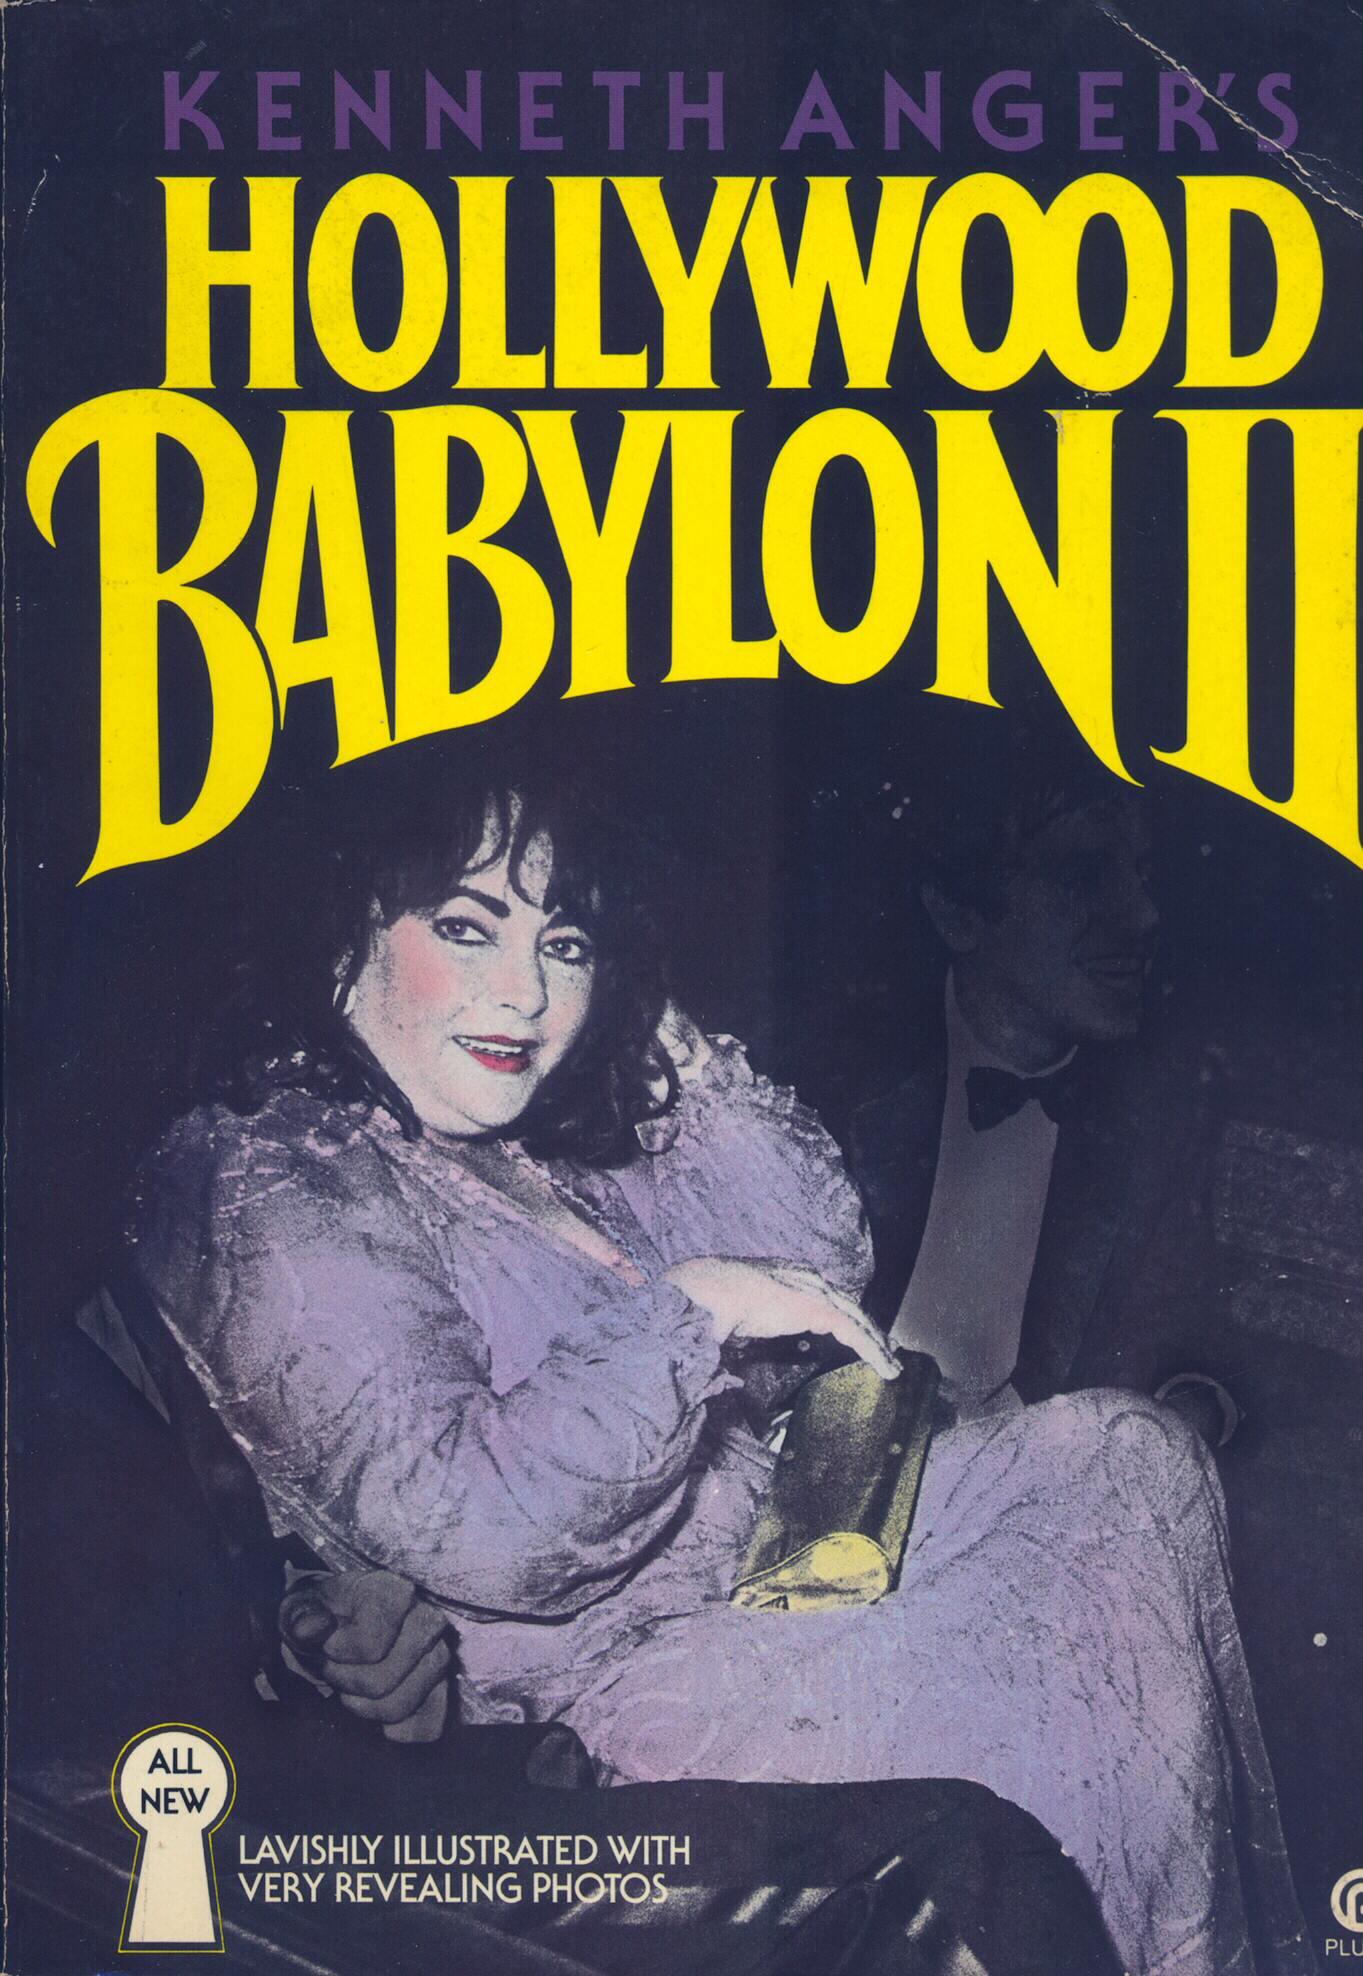 Kenneth Anger's Hollywood Babylon II